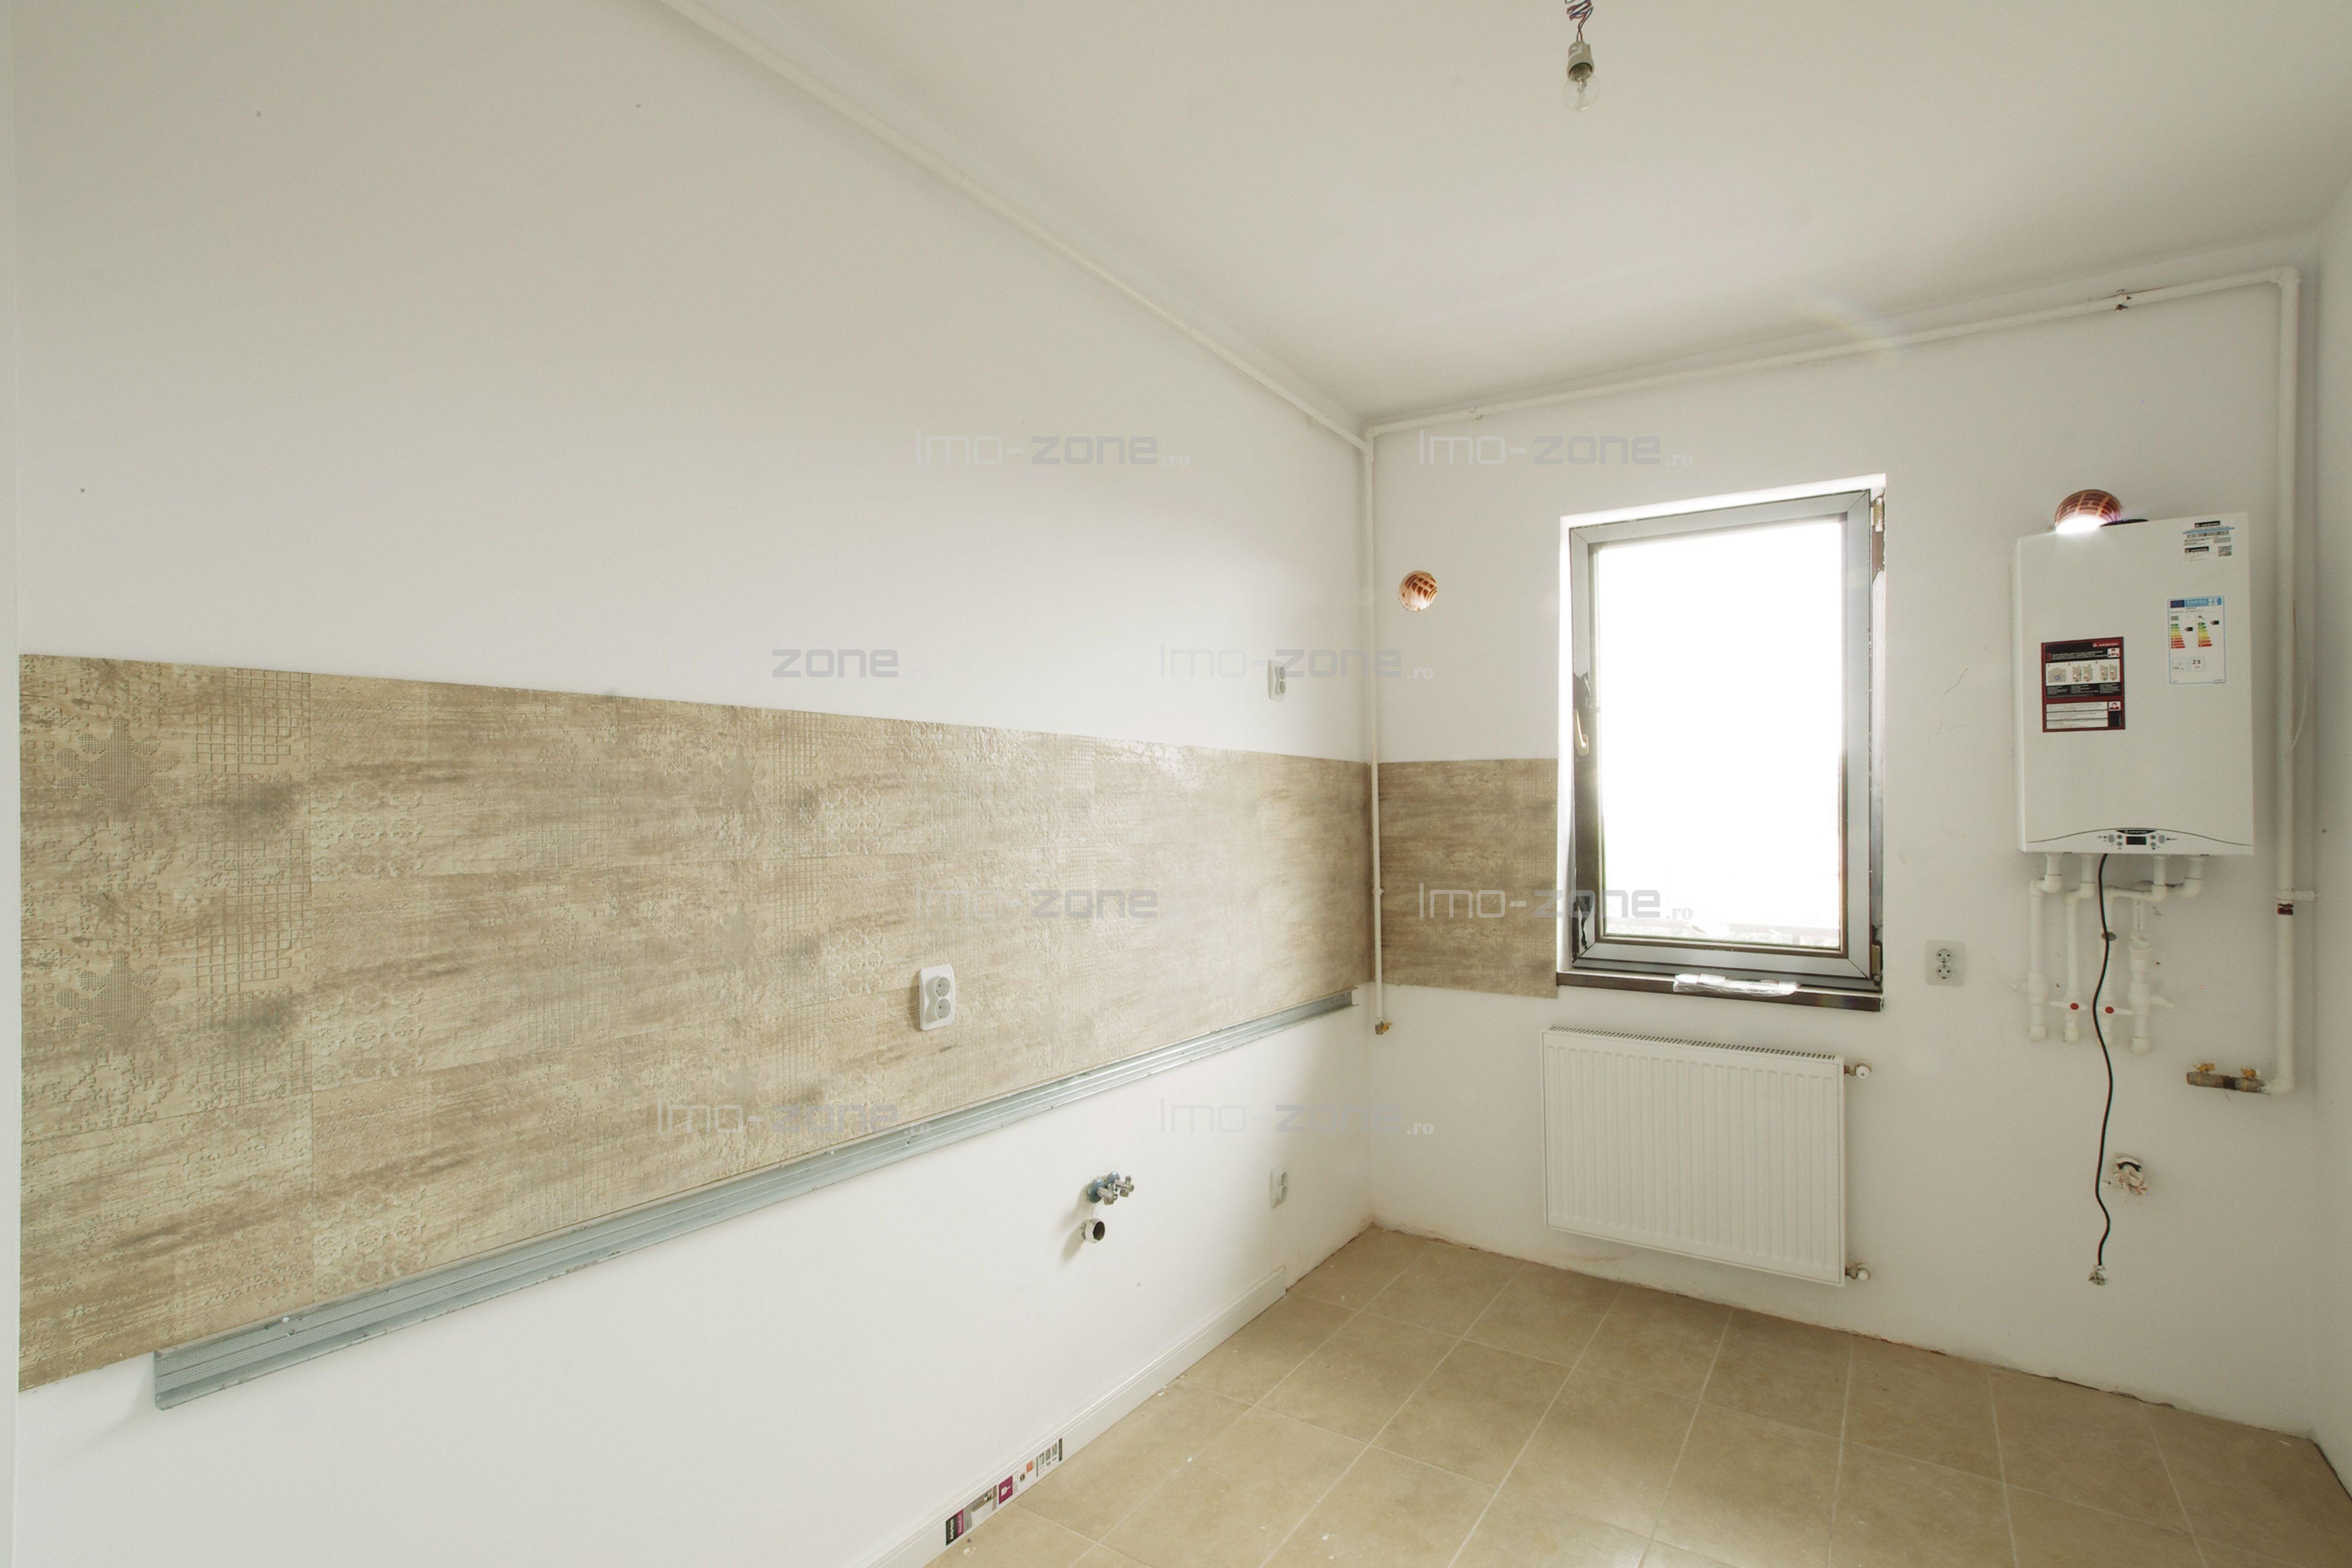 COMISION 0% Apartament cu 2 camere, modern, spatios, FINISAT LA CHEIE.